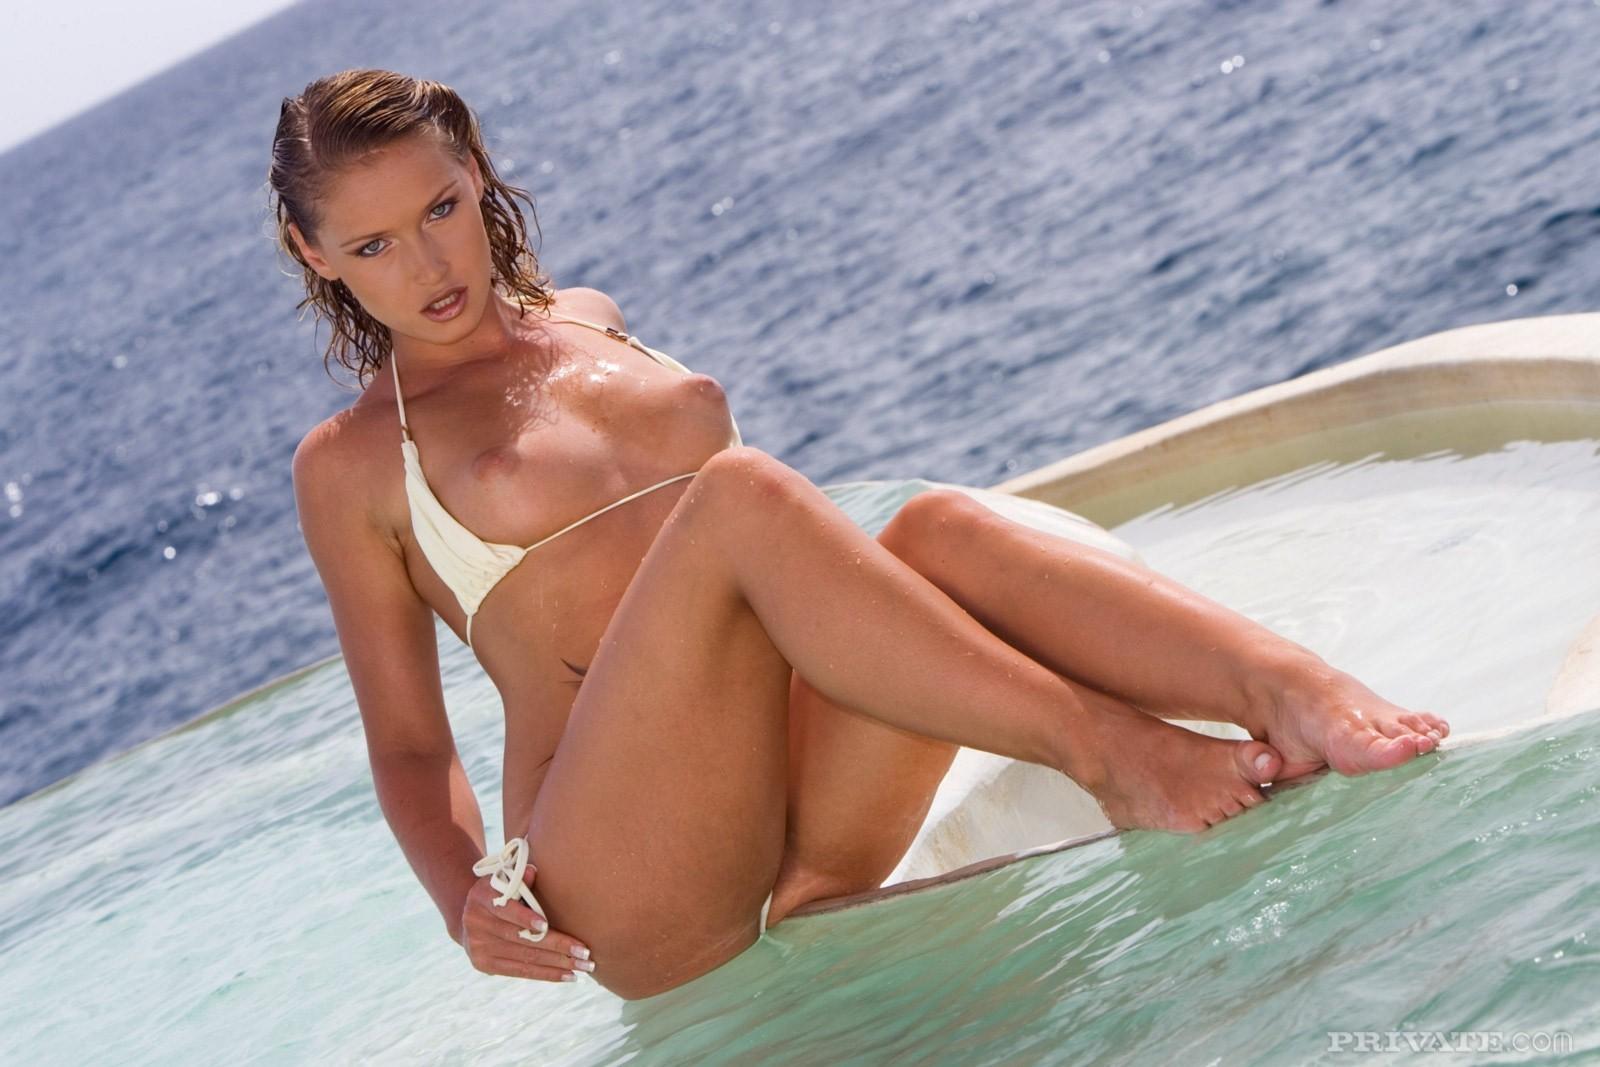 hot naked spanish girls – Other